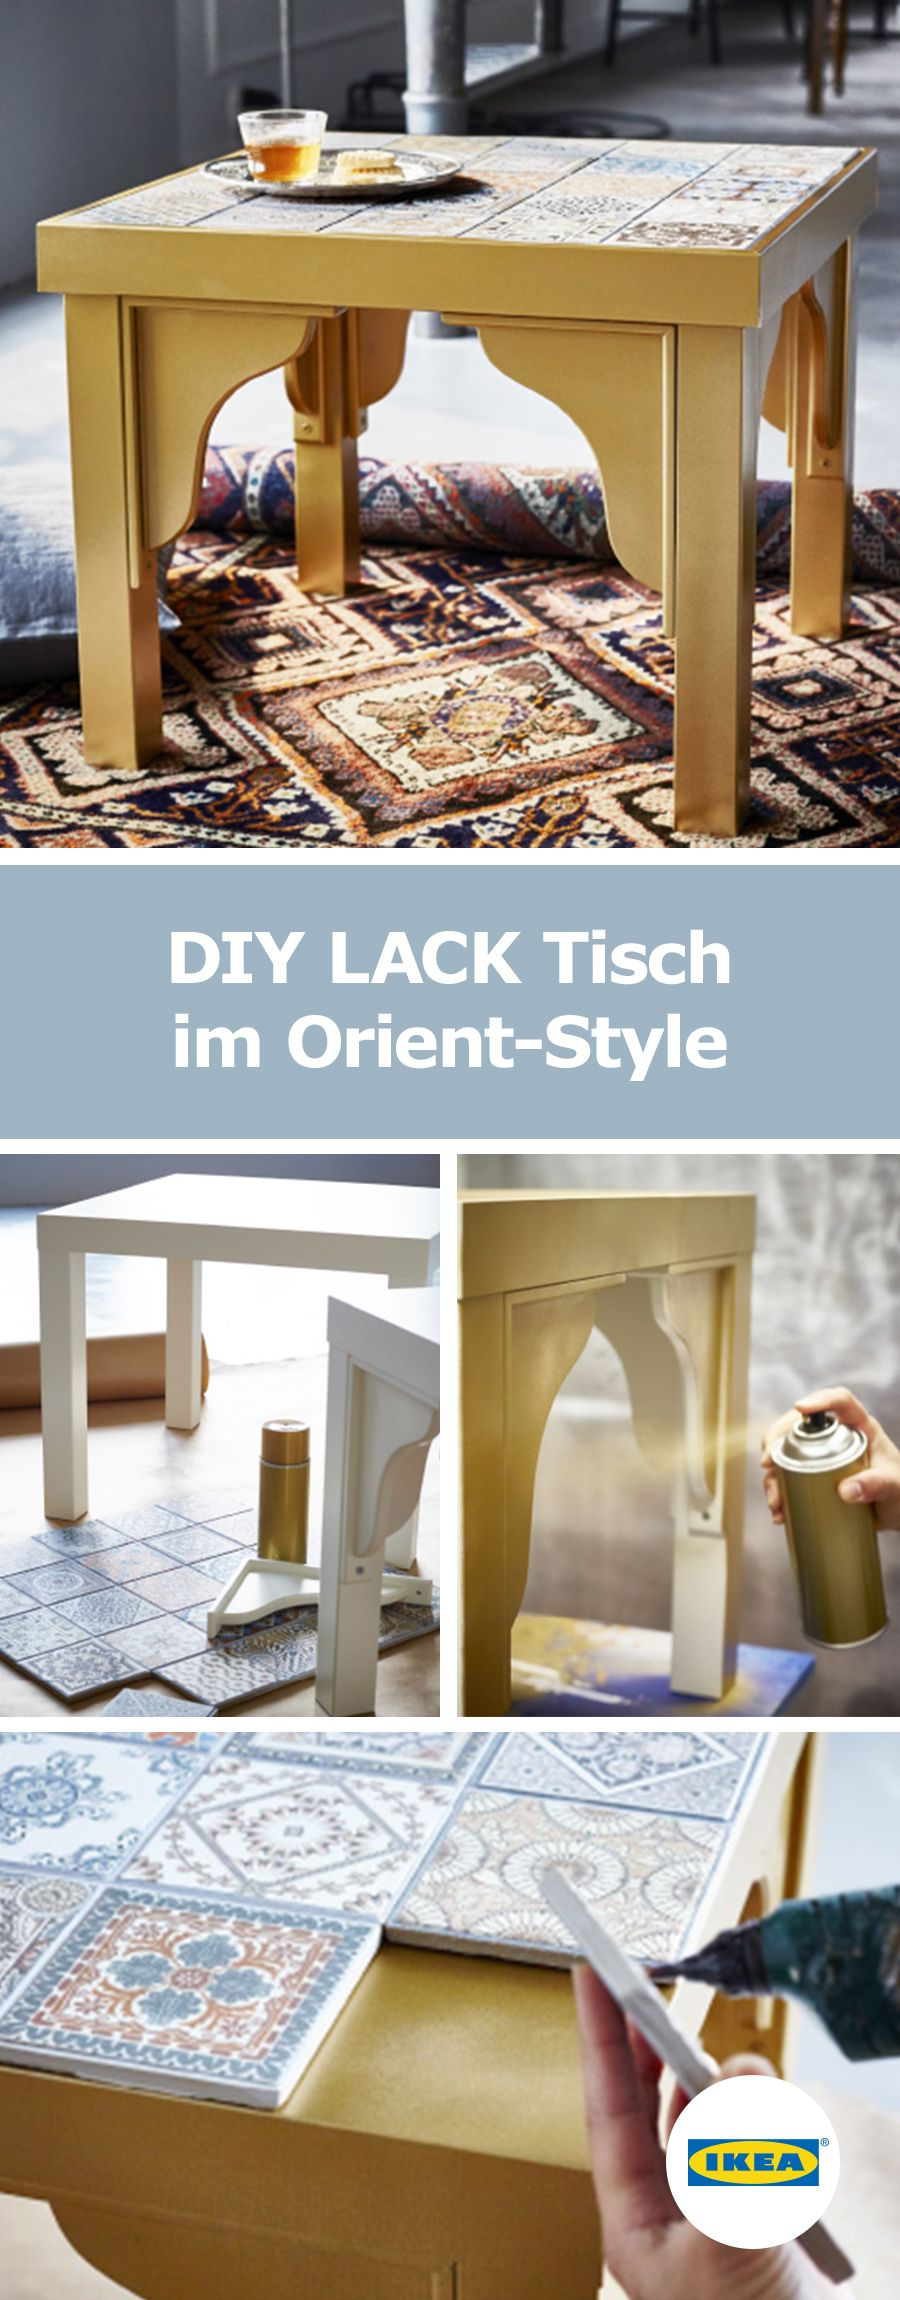 ikea deutschland diy lack tisch orient style ikea hack. Black Bedroom Furniture Sets. Home Design Ideas